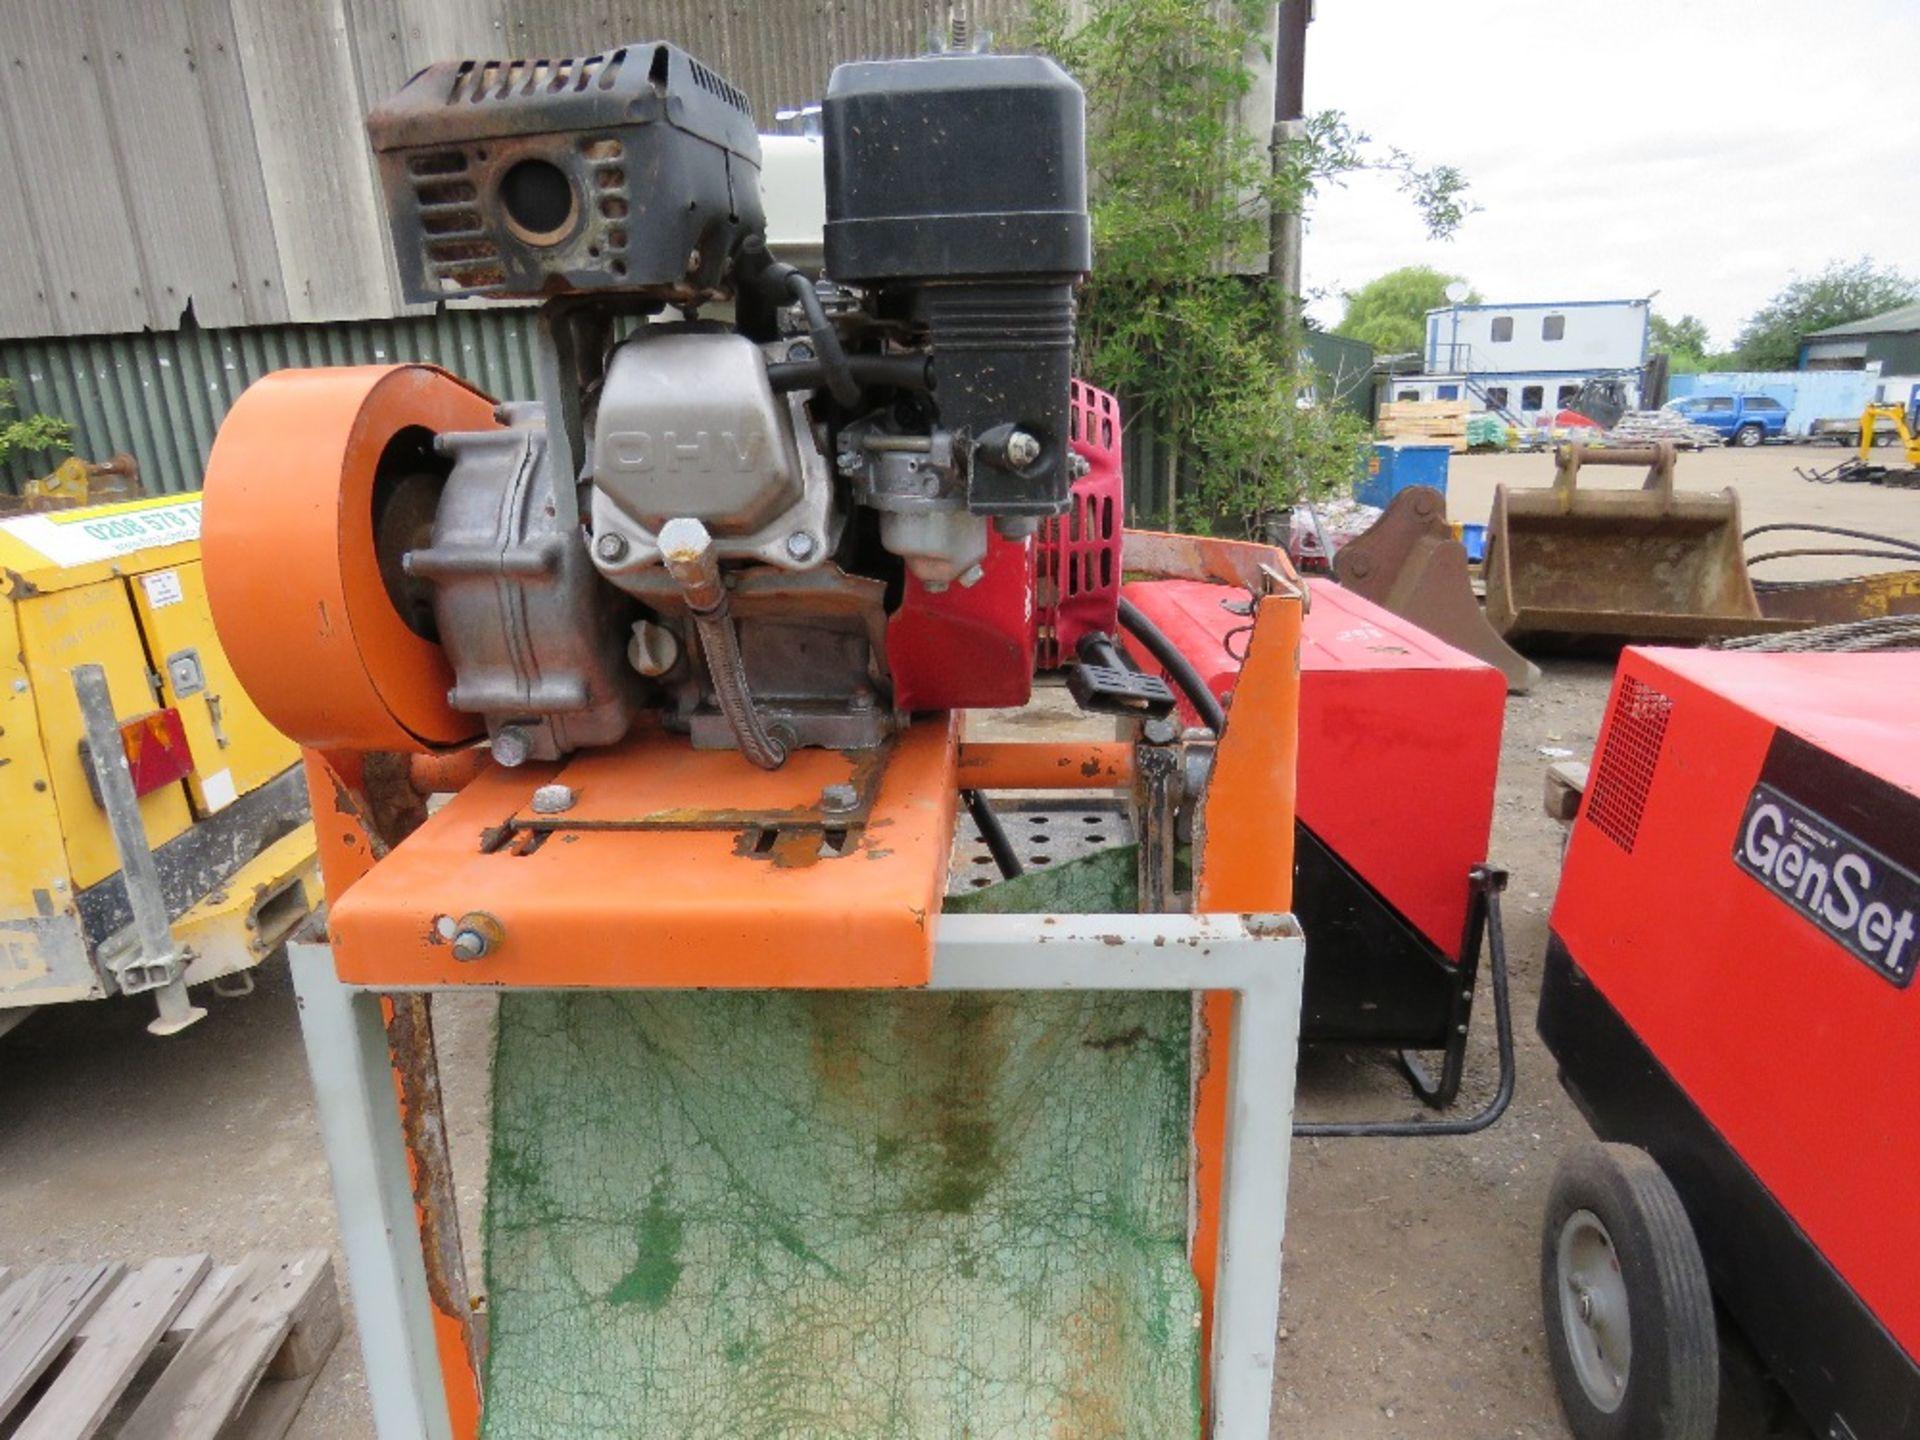 Lot 45 - PETROL ENGINED CLIPPER SAWBENCH